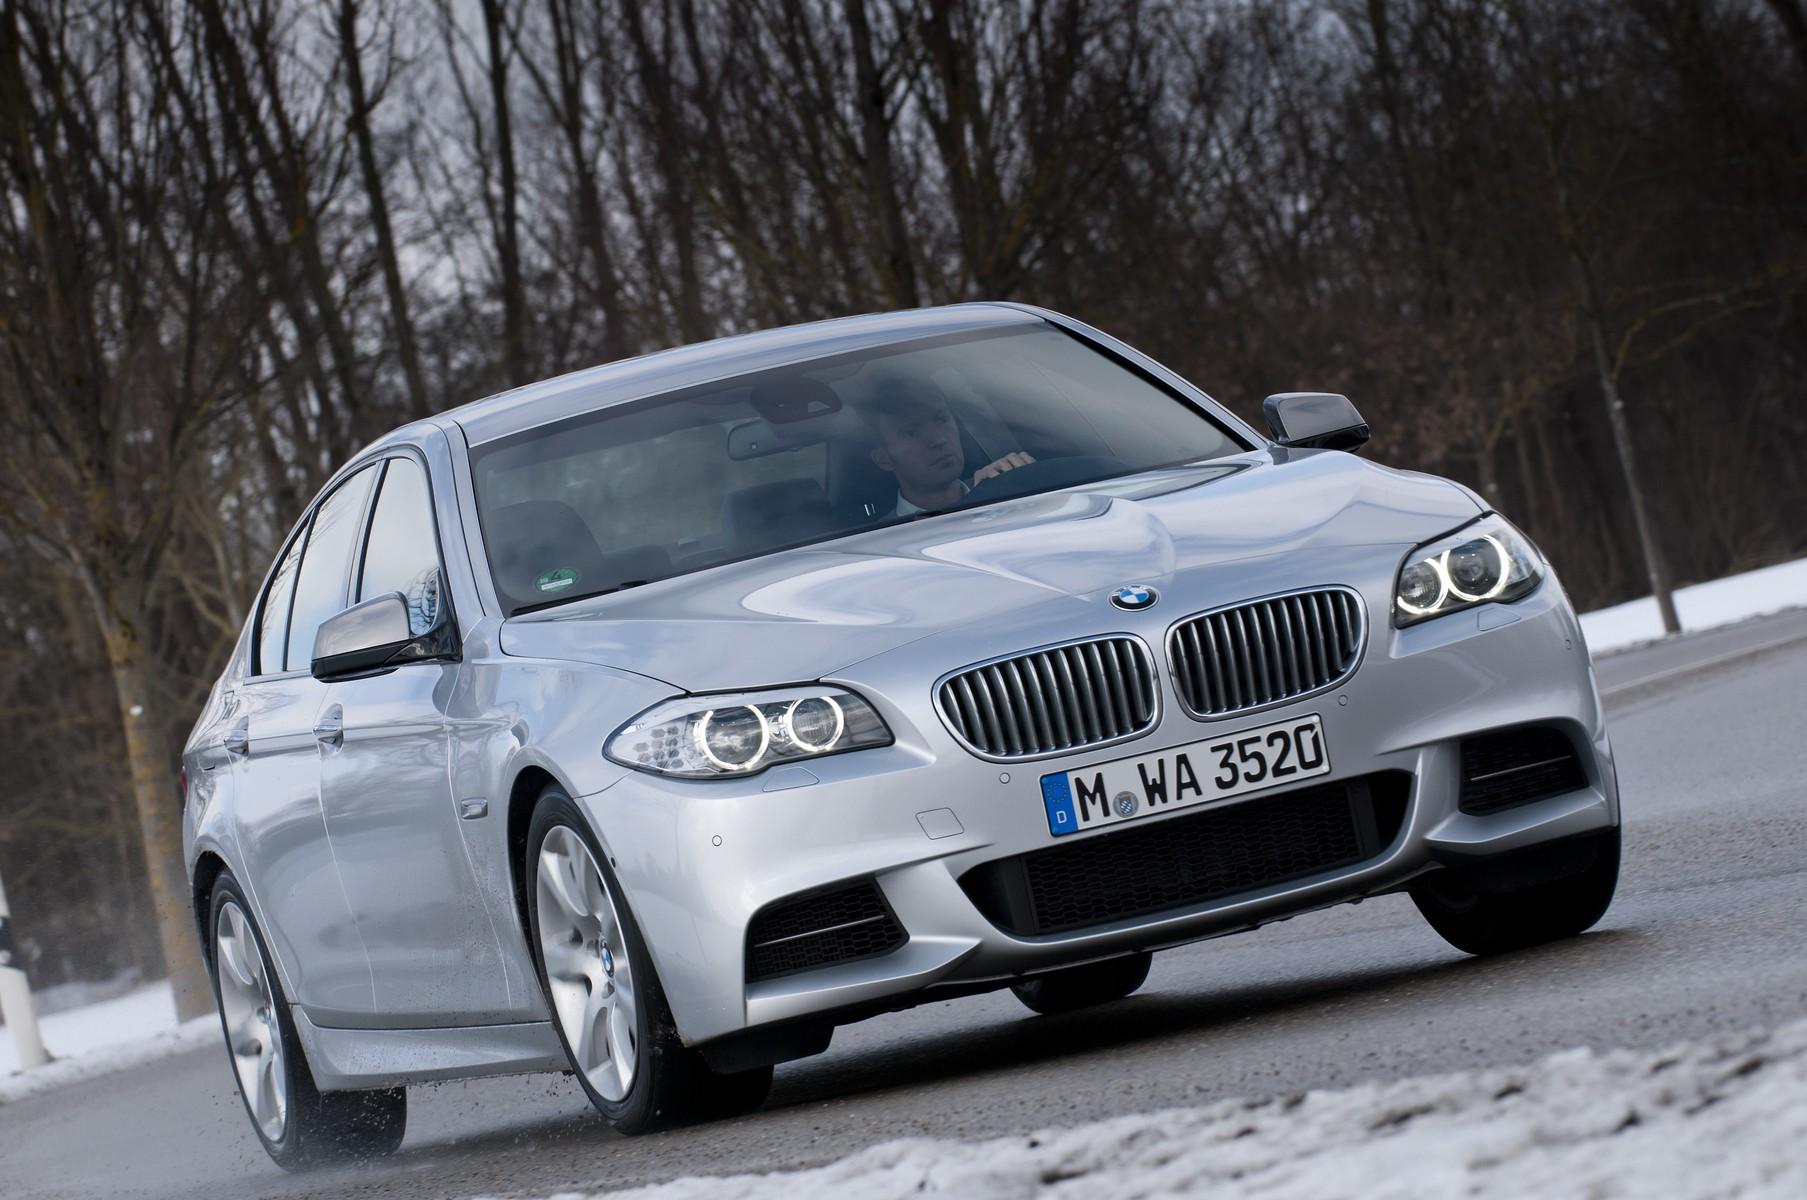 Satılık 2015 model BMW 5.20i